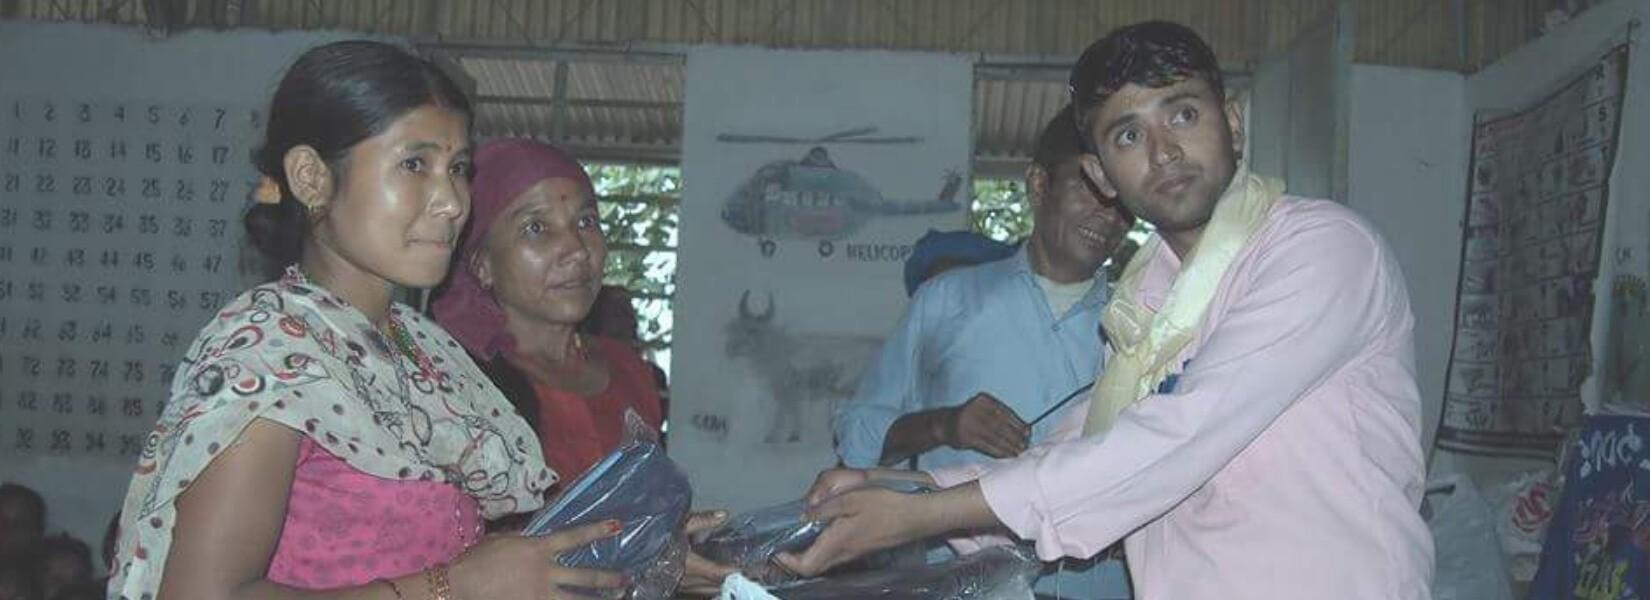 Indirect Way of Volunteering Nepal